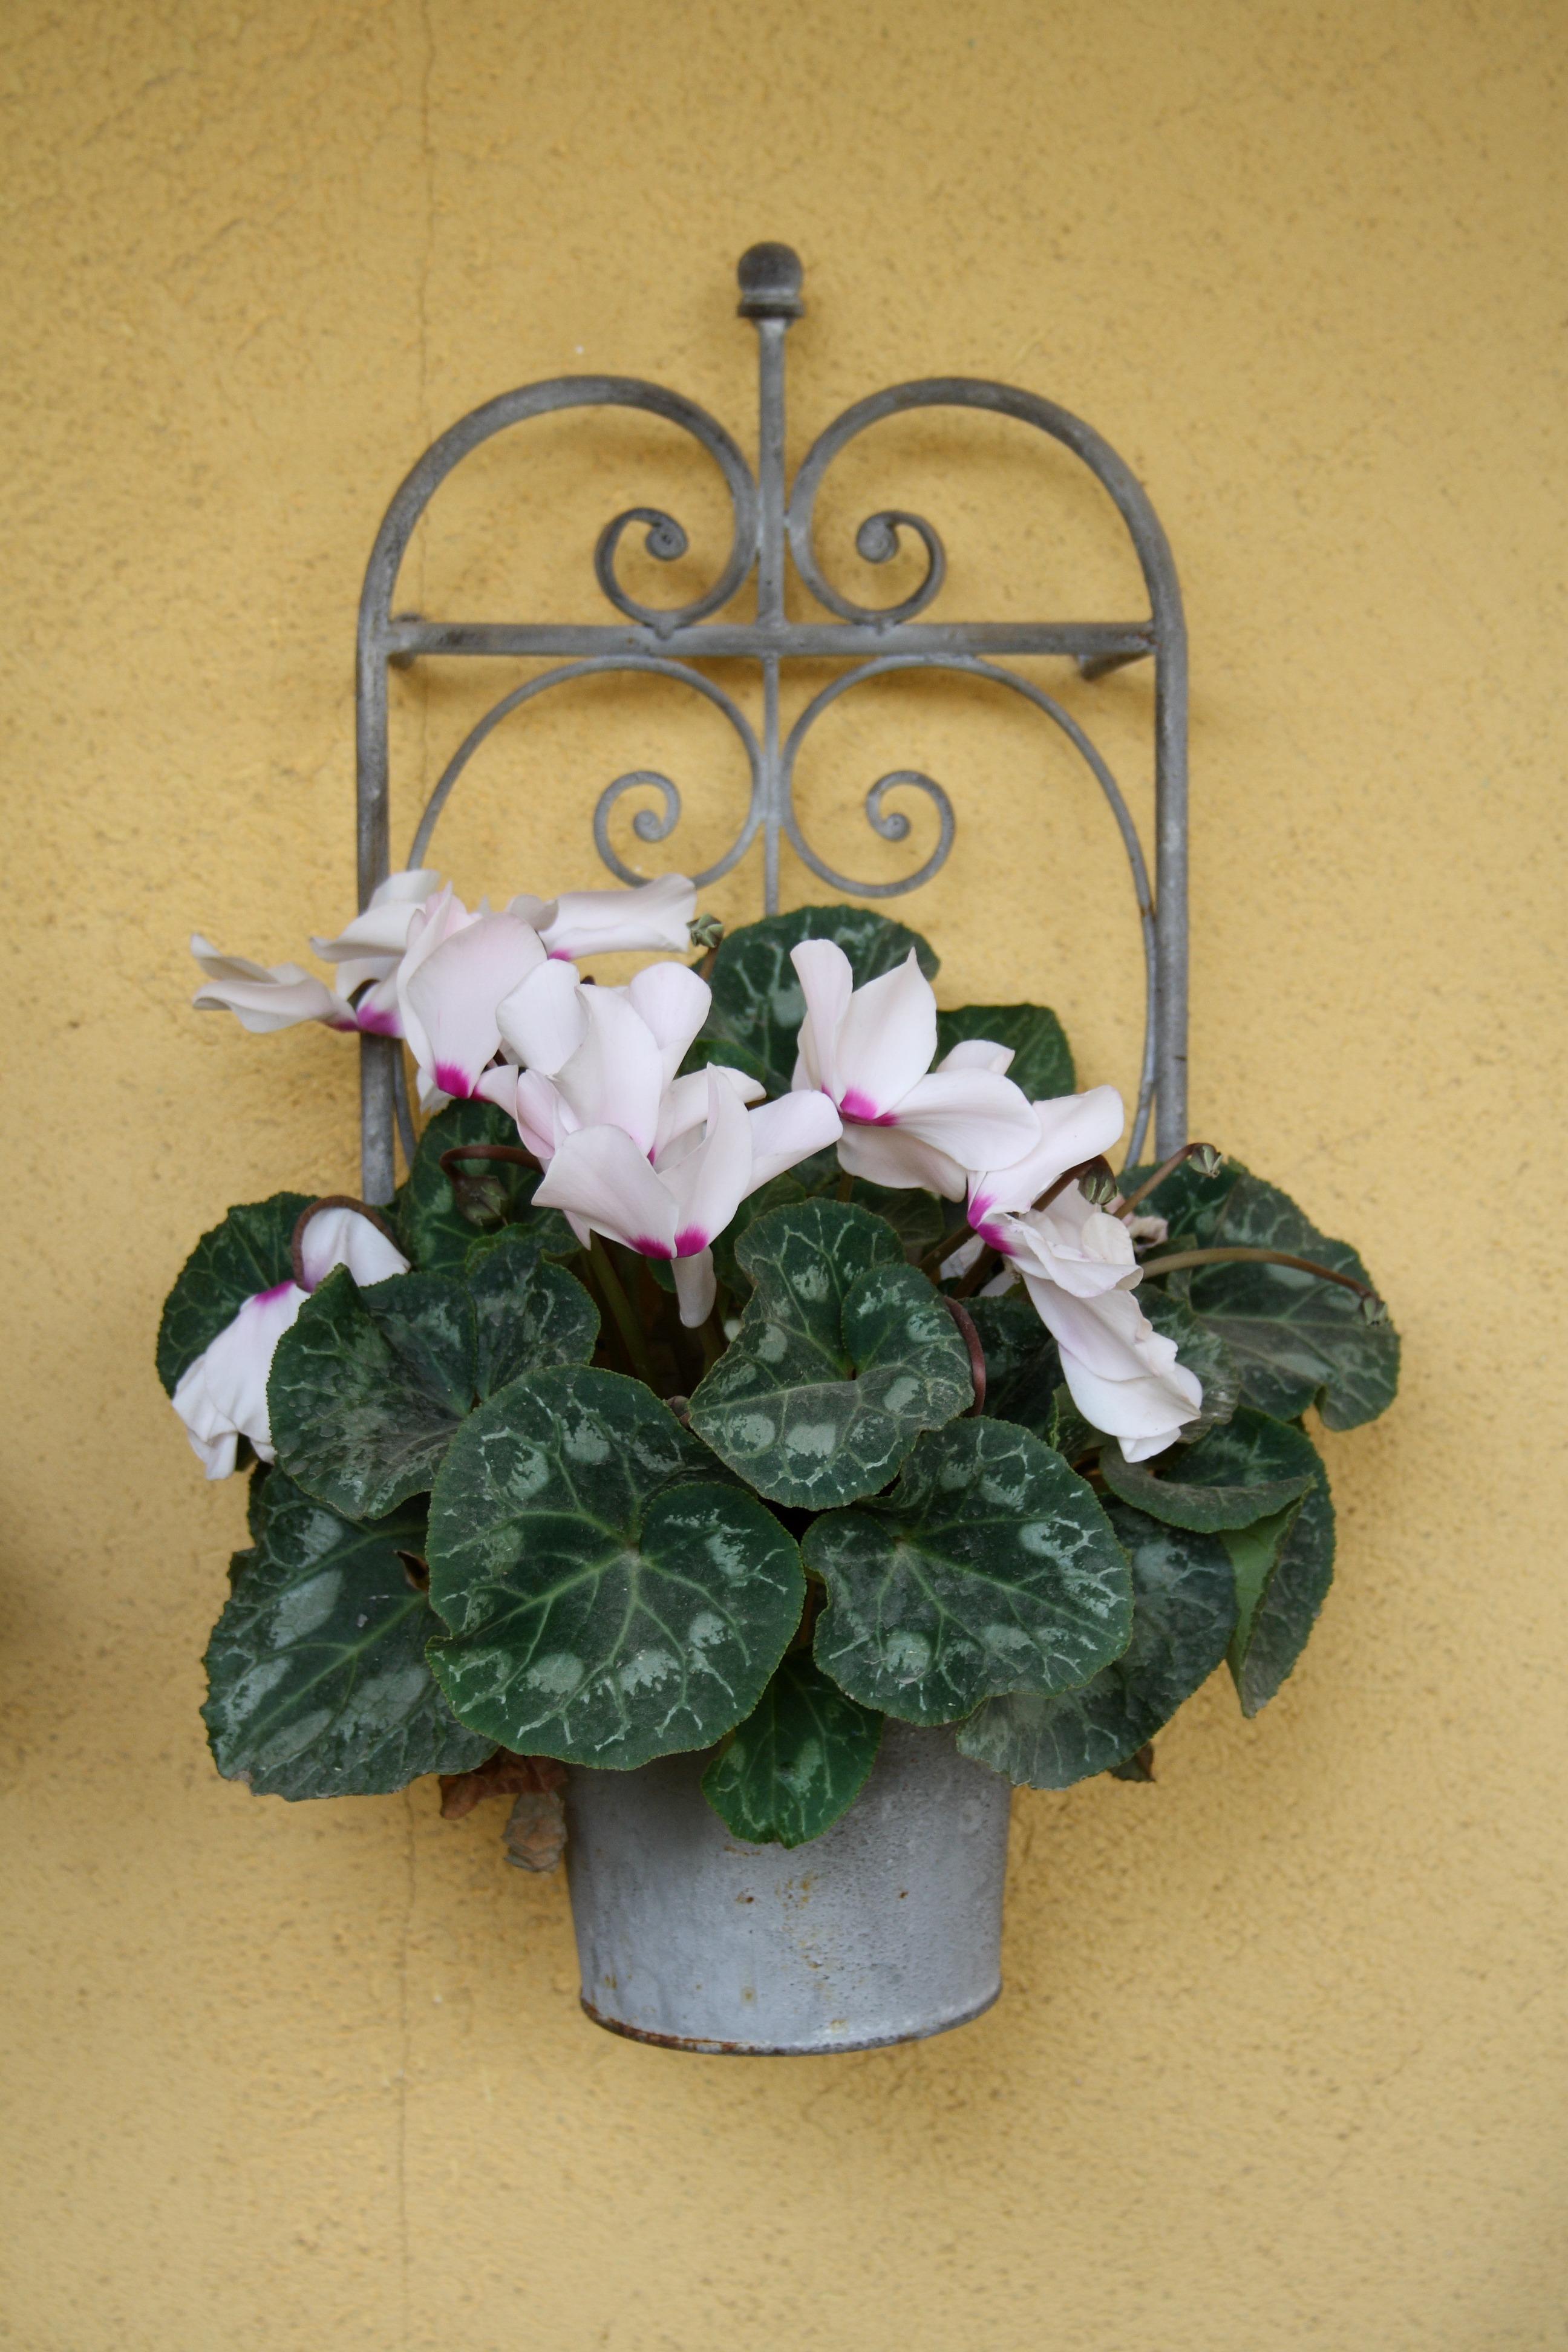 free images : nature, blossom, leaf, petal, bloom, green, red